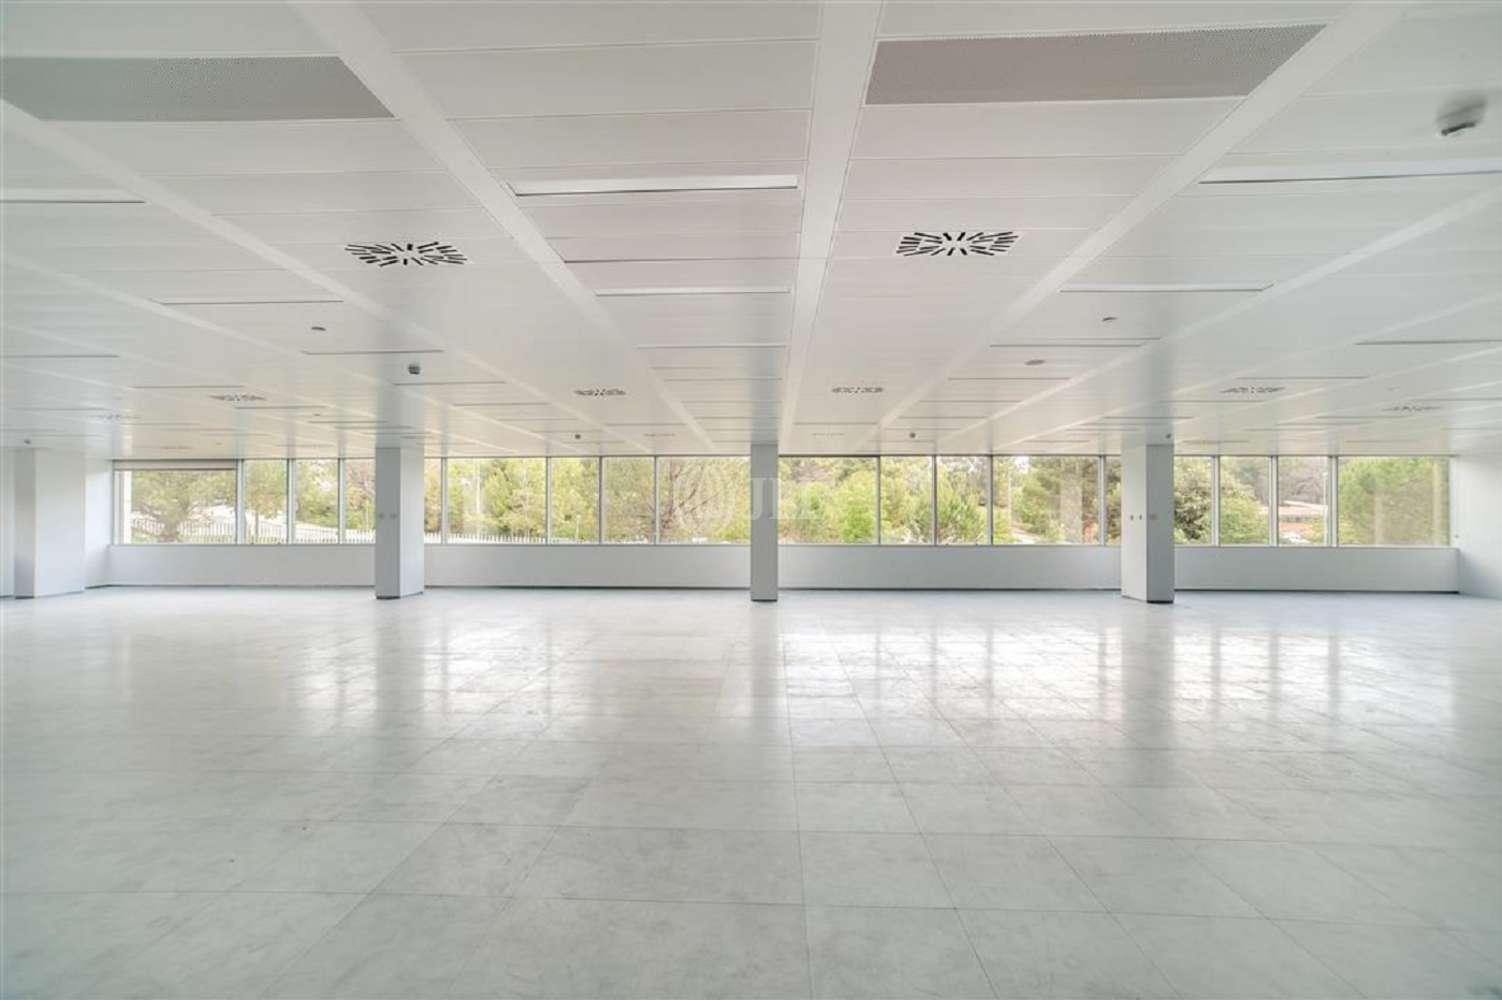 Oficina Sant cugat del vallès, 08174 - SANT CUGAT NORD - Edificio C